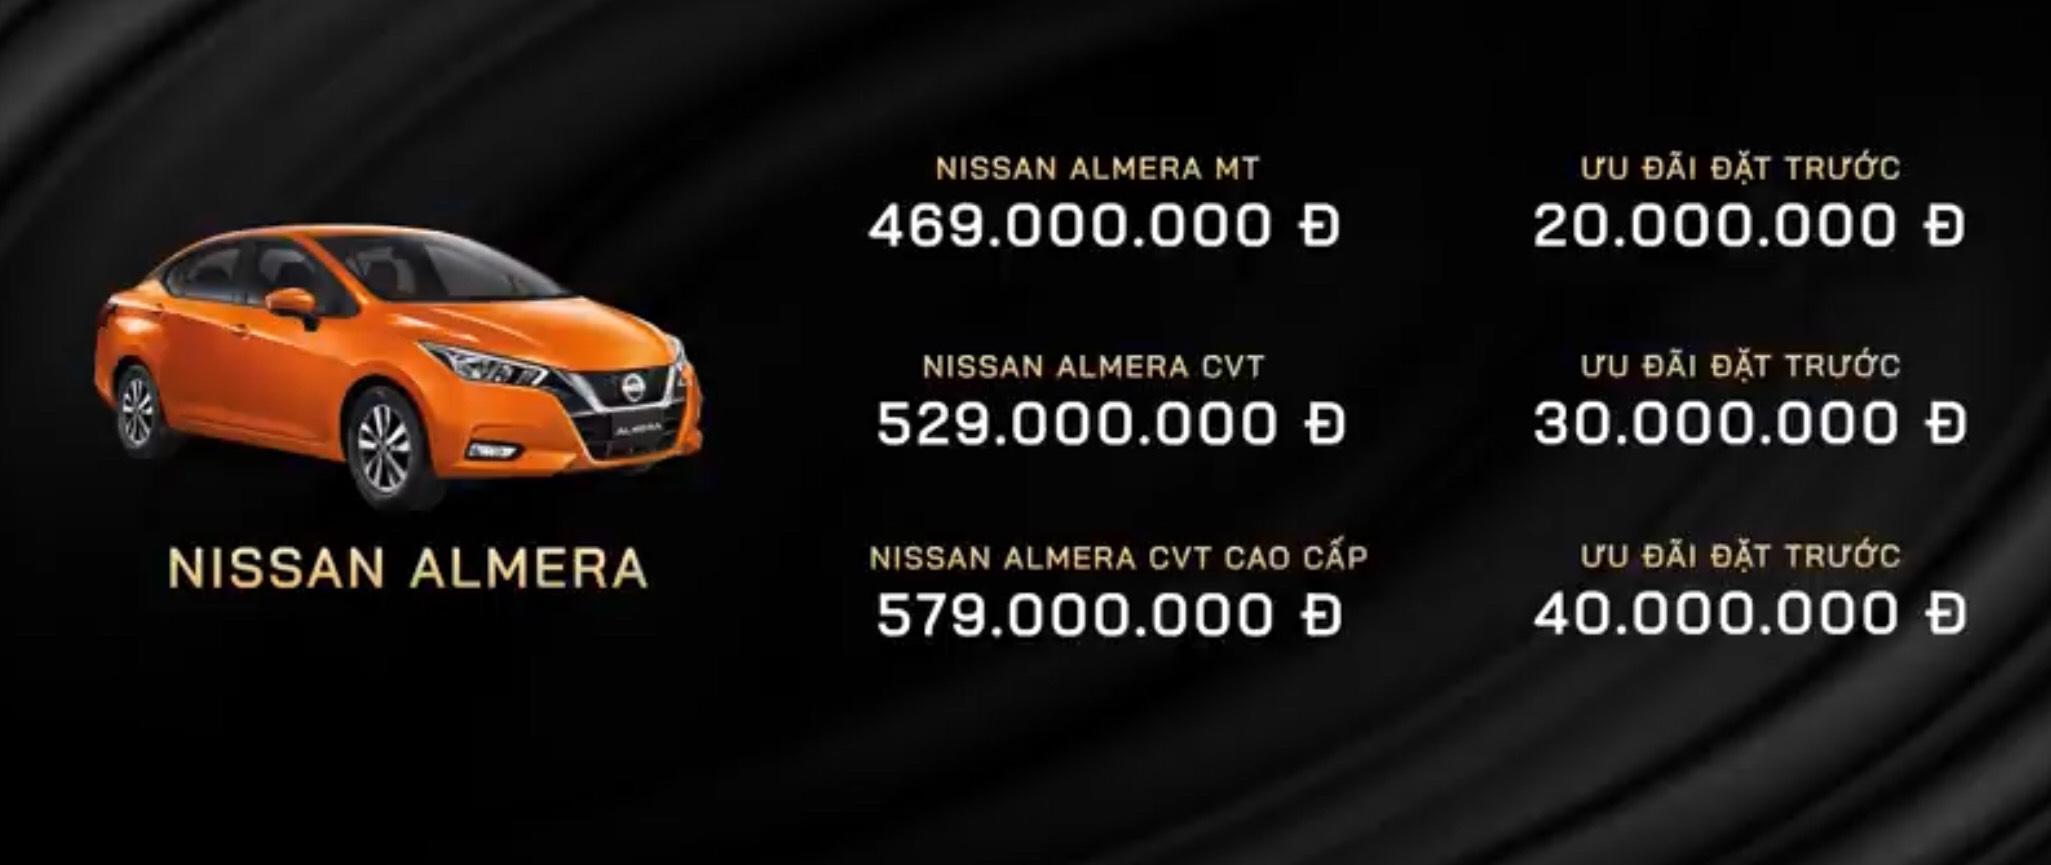 Giá Nissan Almera 2021